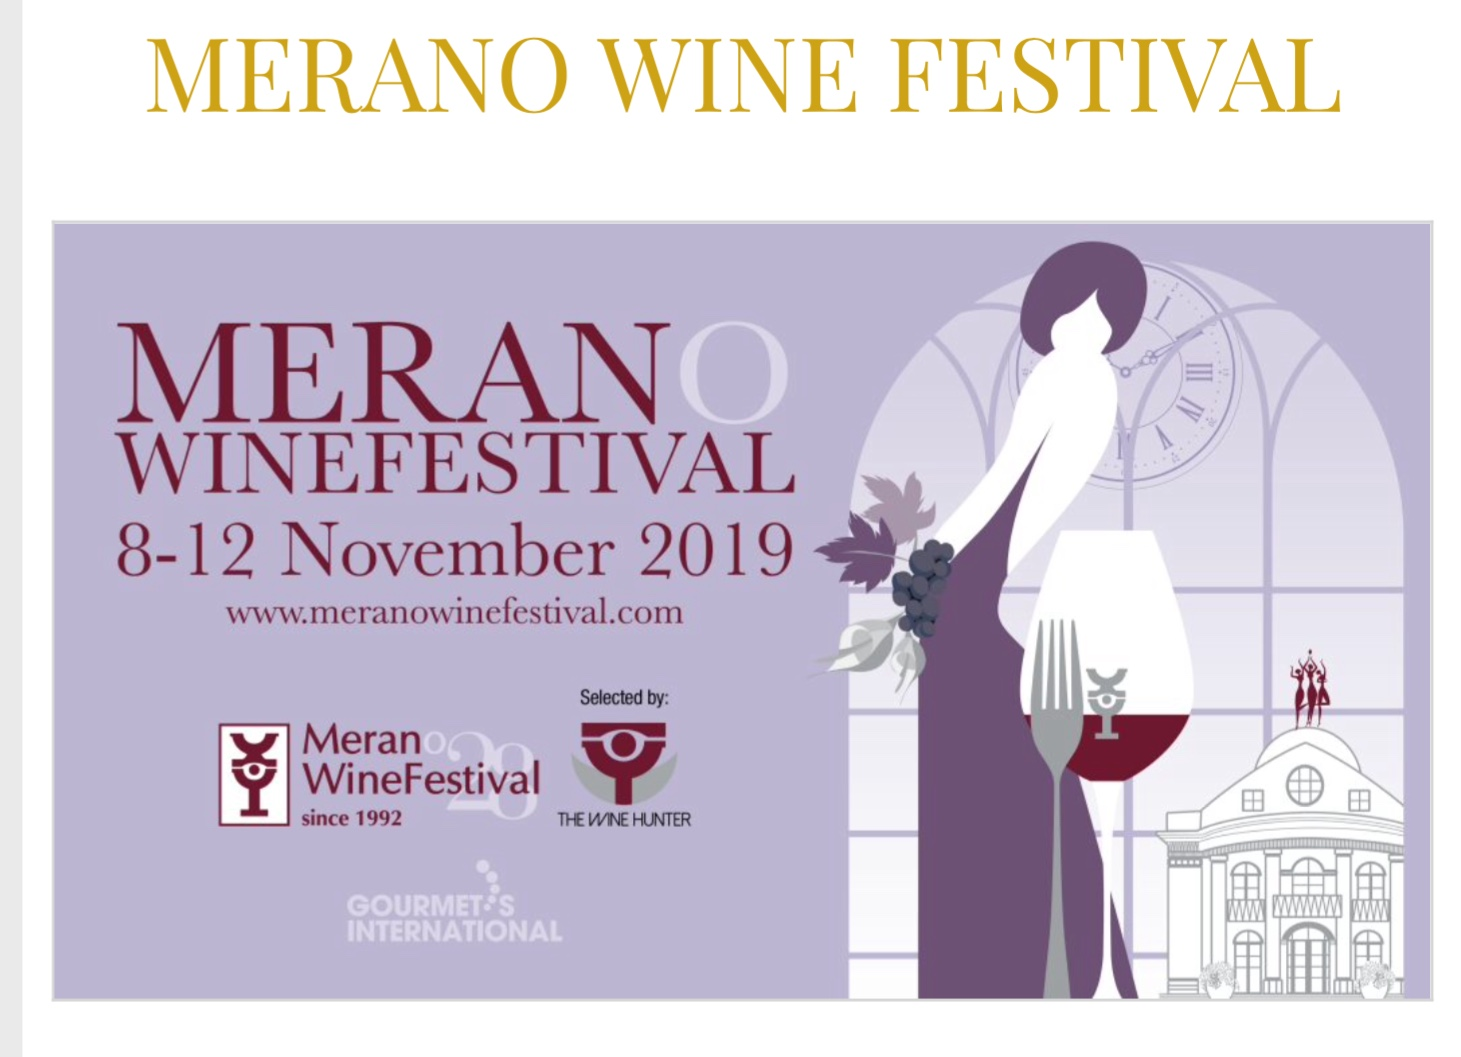 Merano WineFestival, l'imperdibile festa del vino